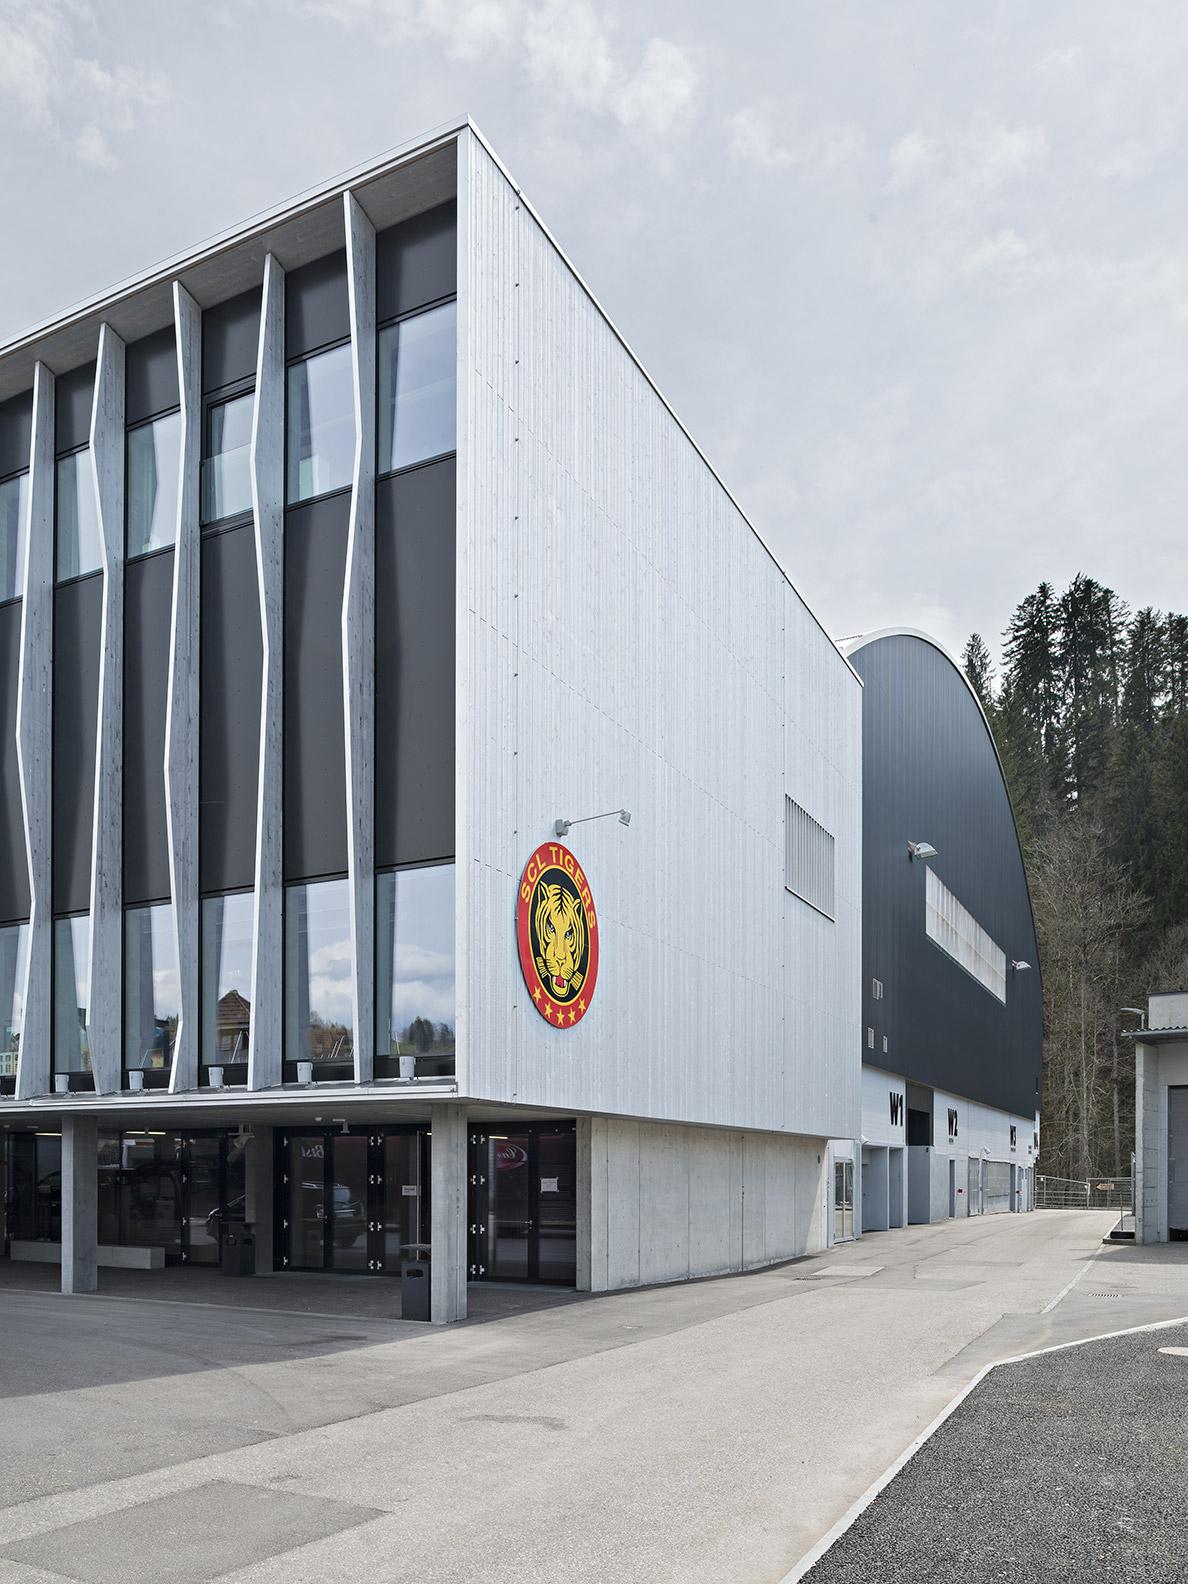 Estadio-Tigers-Langnau.-Suiza.-Propanel-Larson-PE-PVdF-ral-9005-700m2_1591090949.jpg